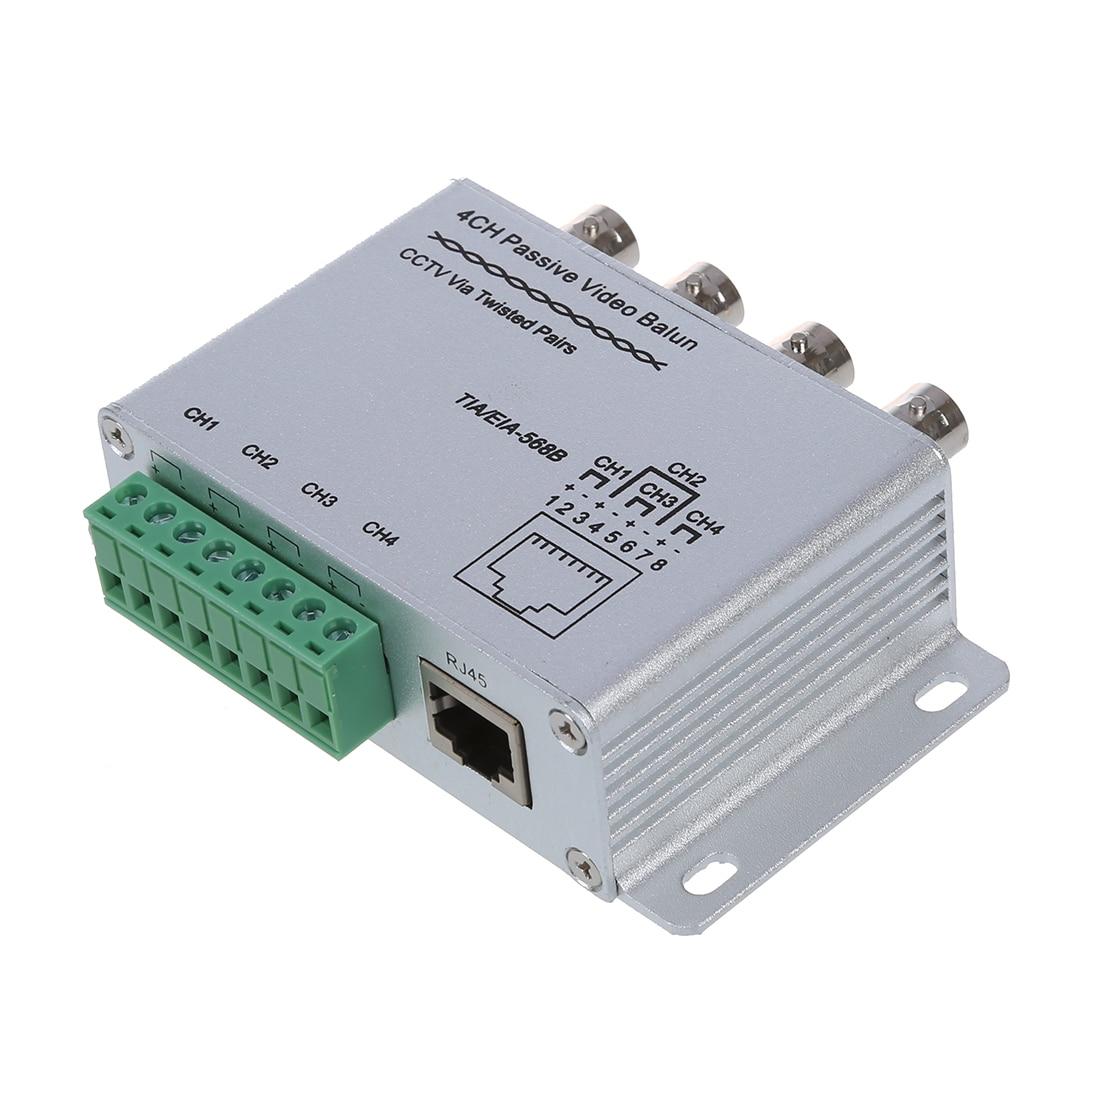 UTP 4 Channel Passive Video Balun Transceiver promotion new silver utp 4 channel passive video balun transceiver adapter